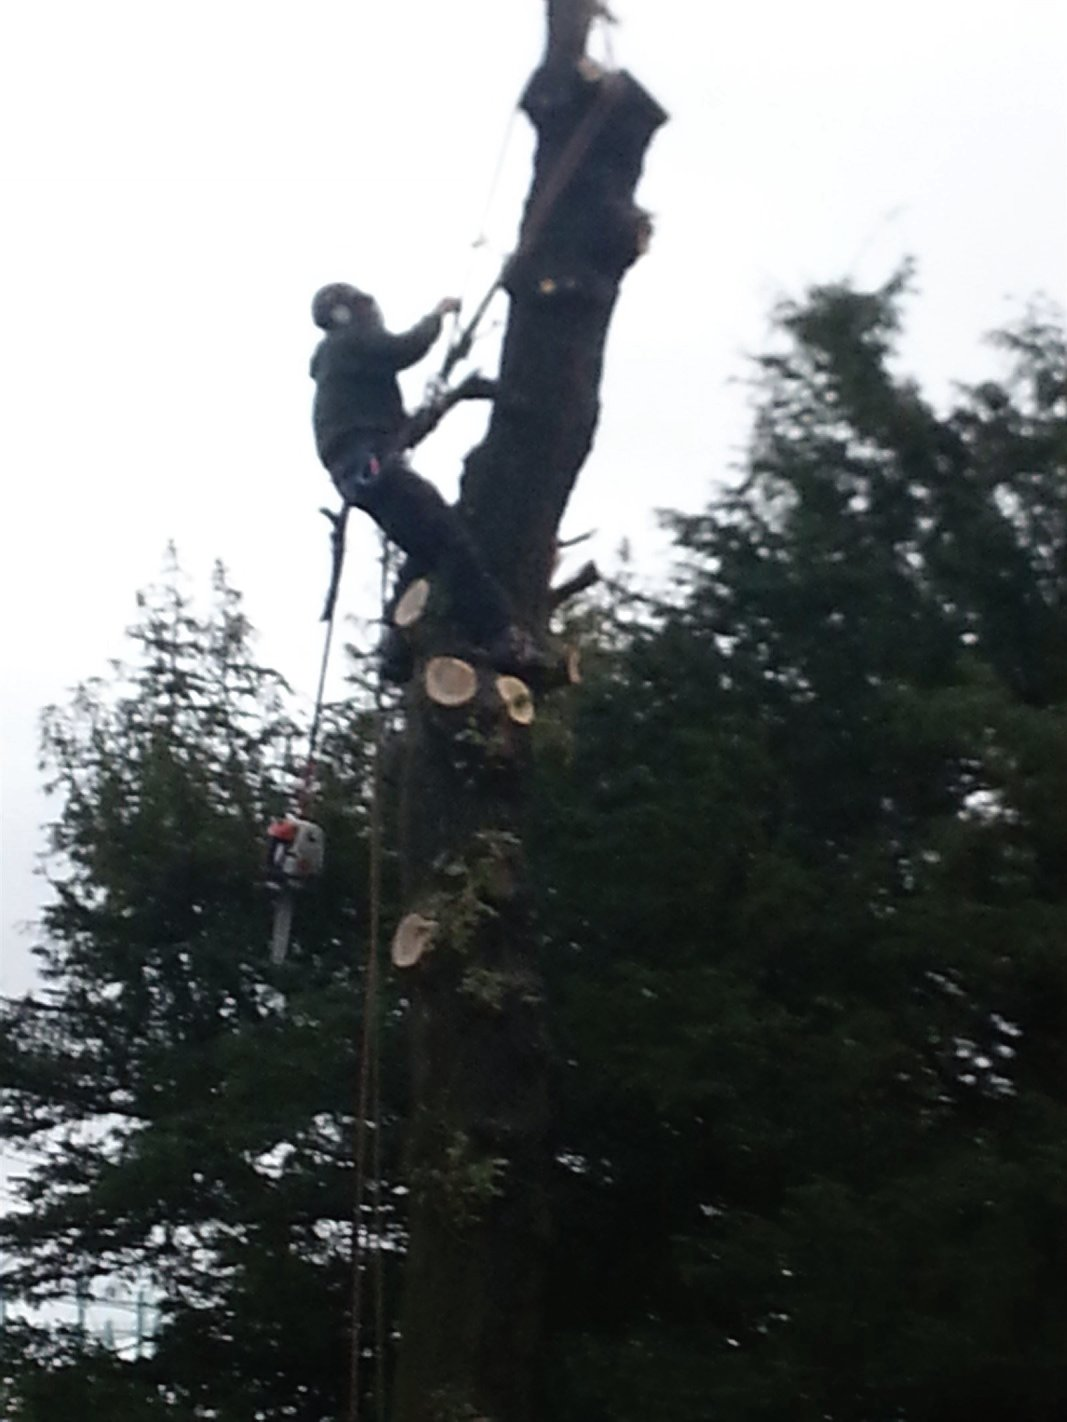 Storm damaged tree surgery works in Edinburgh, Midlothian, East Lothian, Fife and the Scottish Borders regions